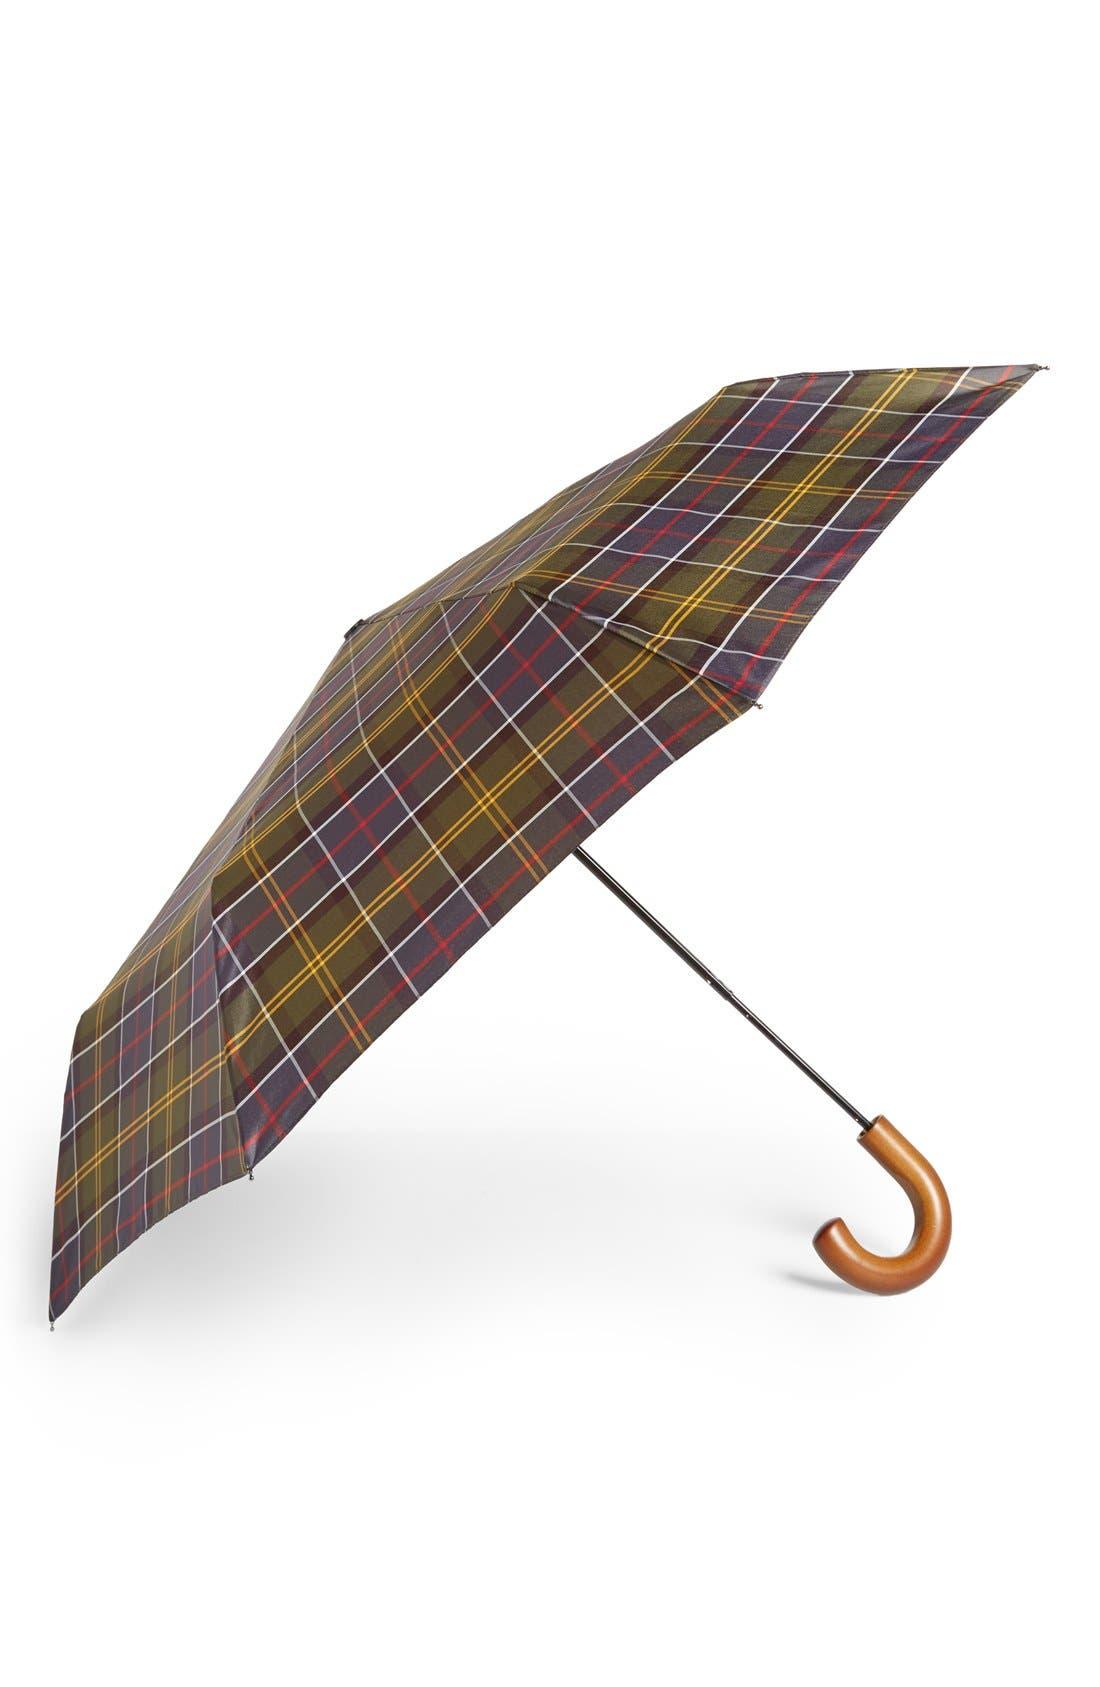 Telescoping Tartan Umbrella,                             Main thumbnail 1, color,                             Green/ Yellow/ Brown